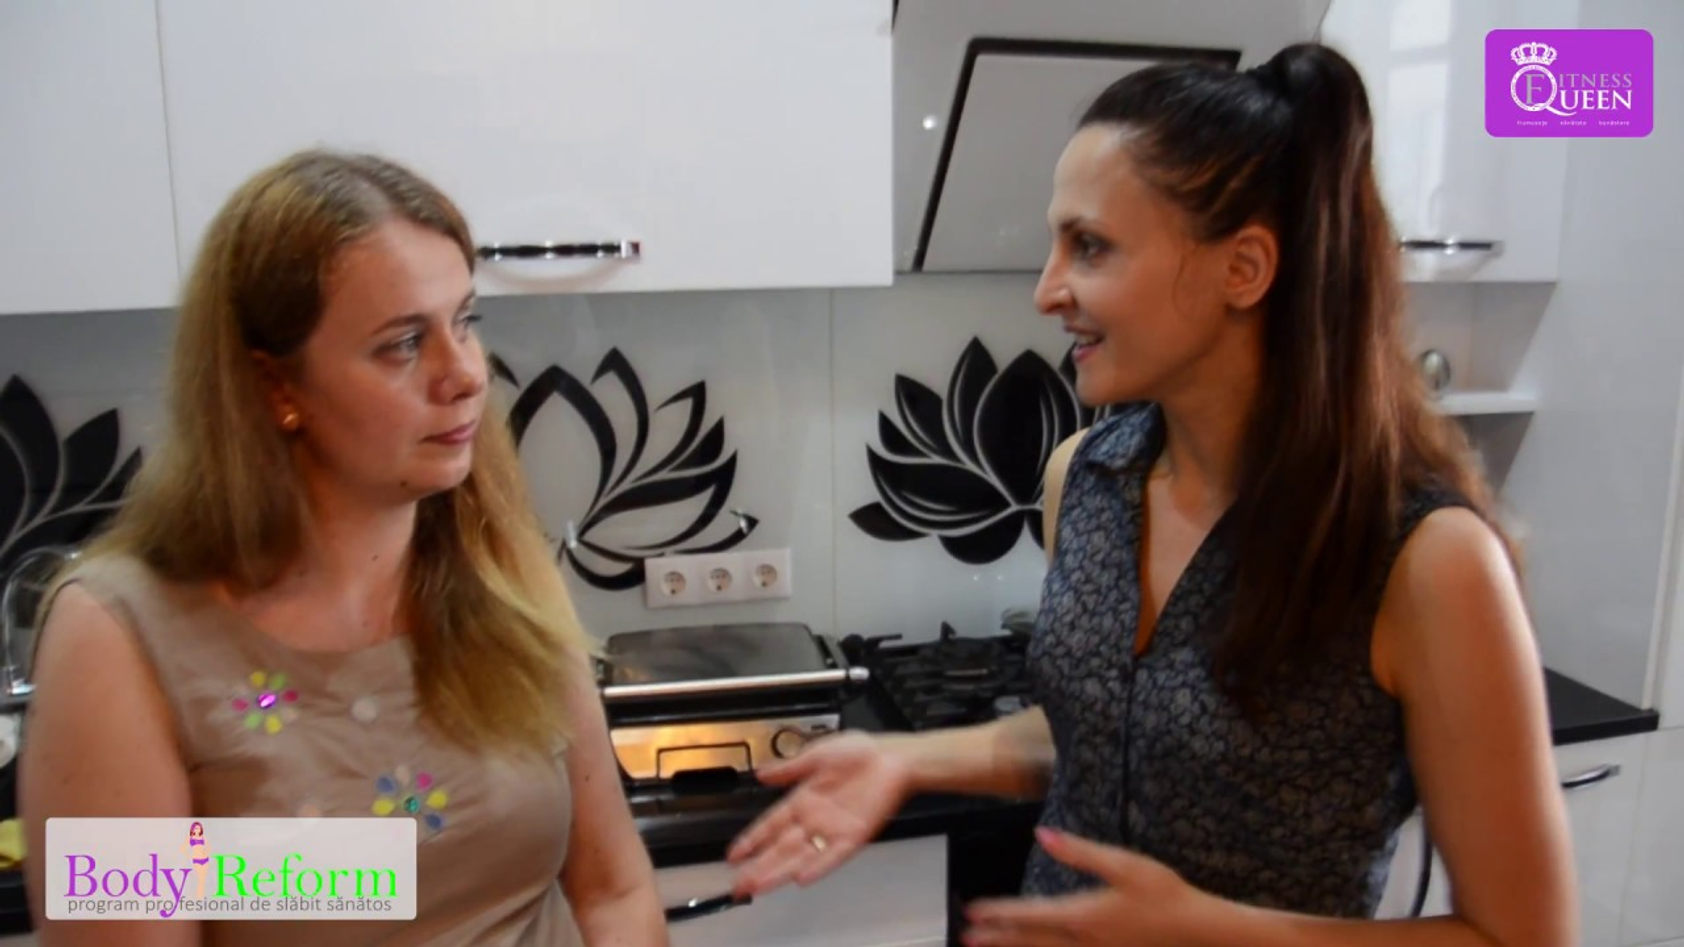 Queen Fitness,Body Reform, Svetlana Zincenco,episodul 2